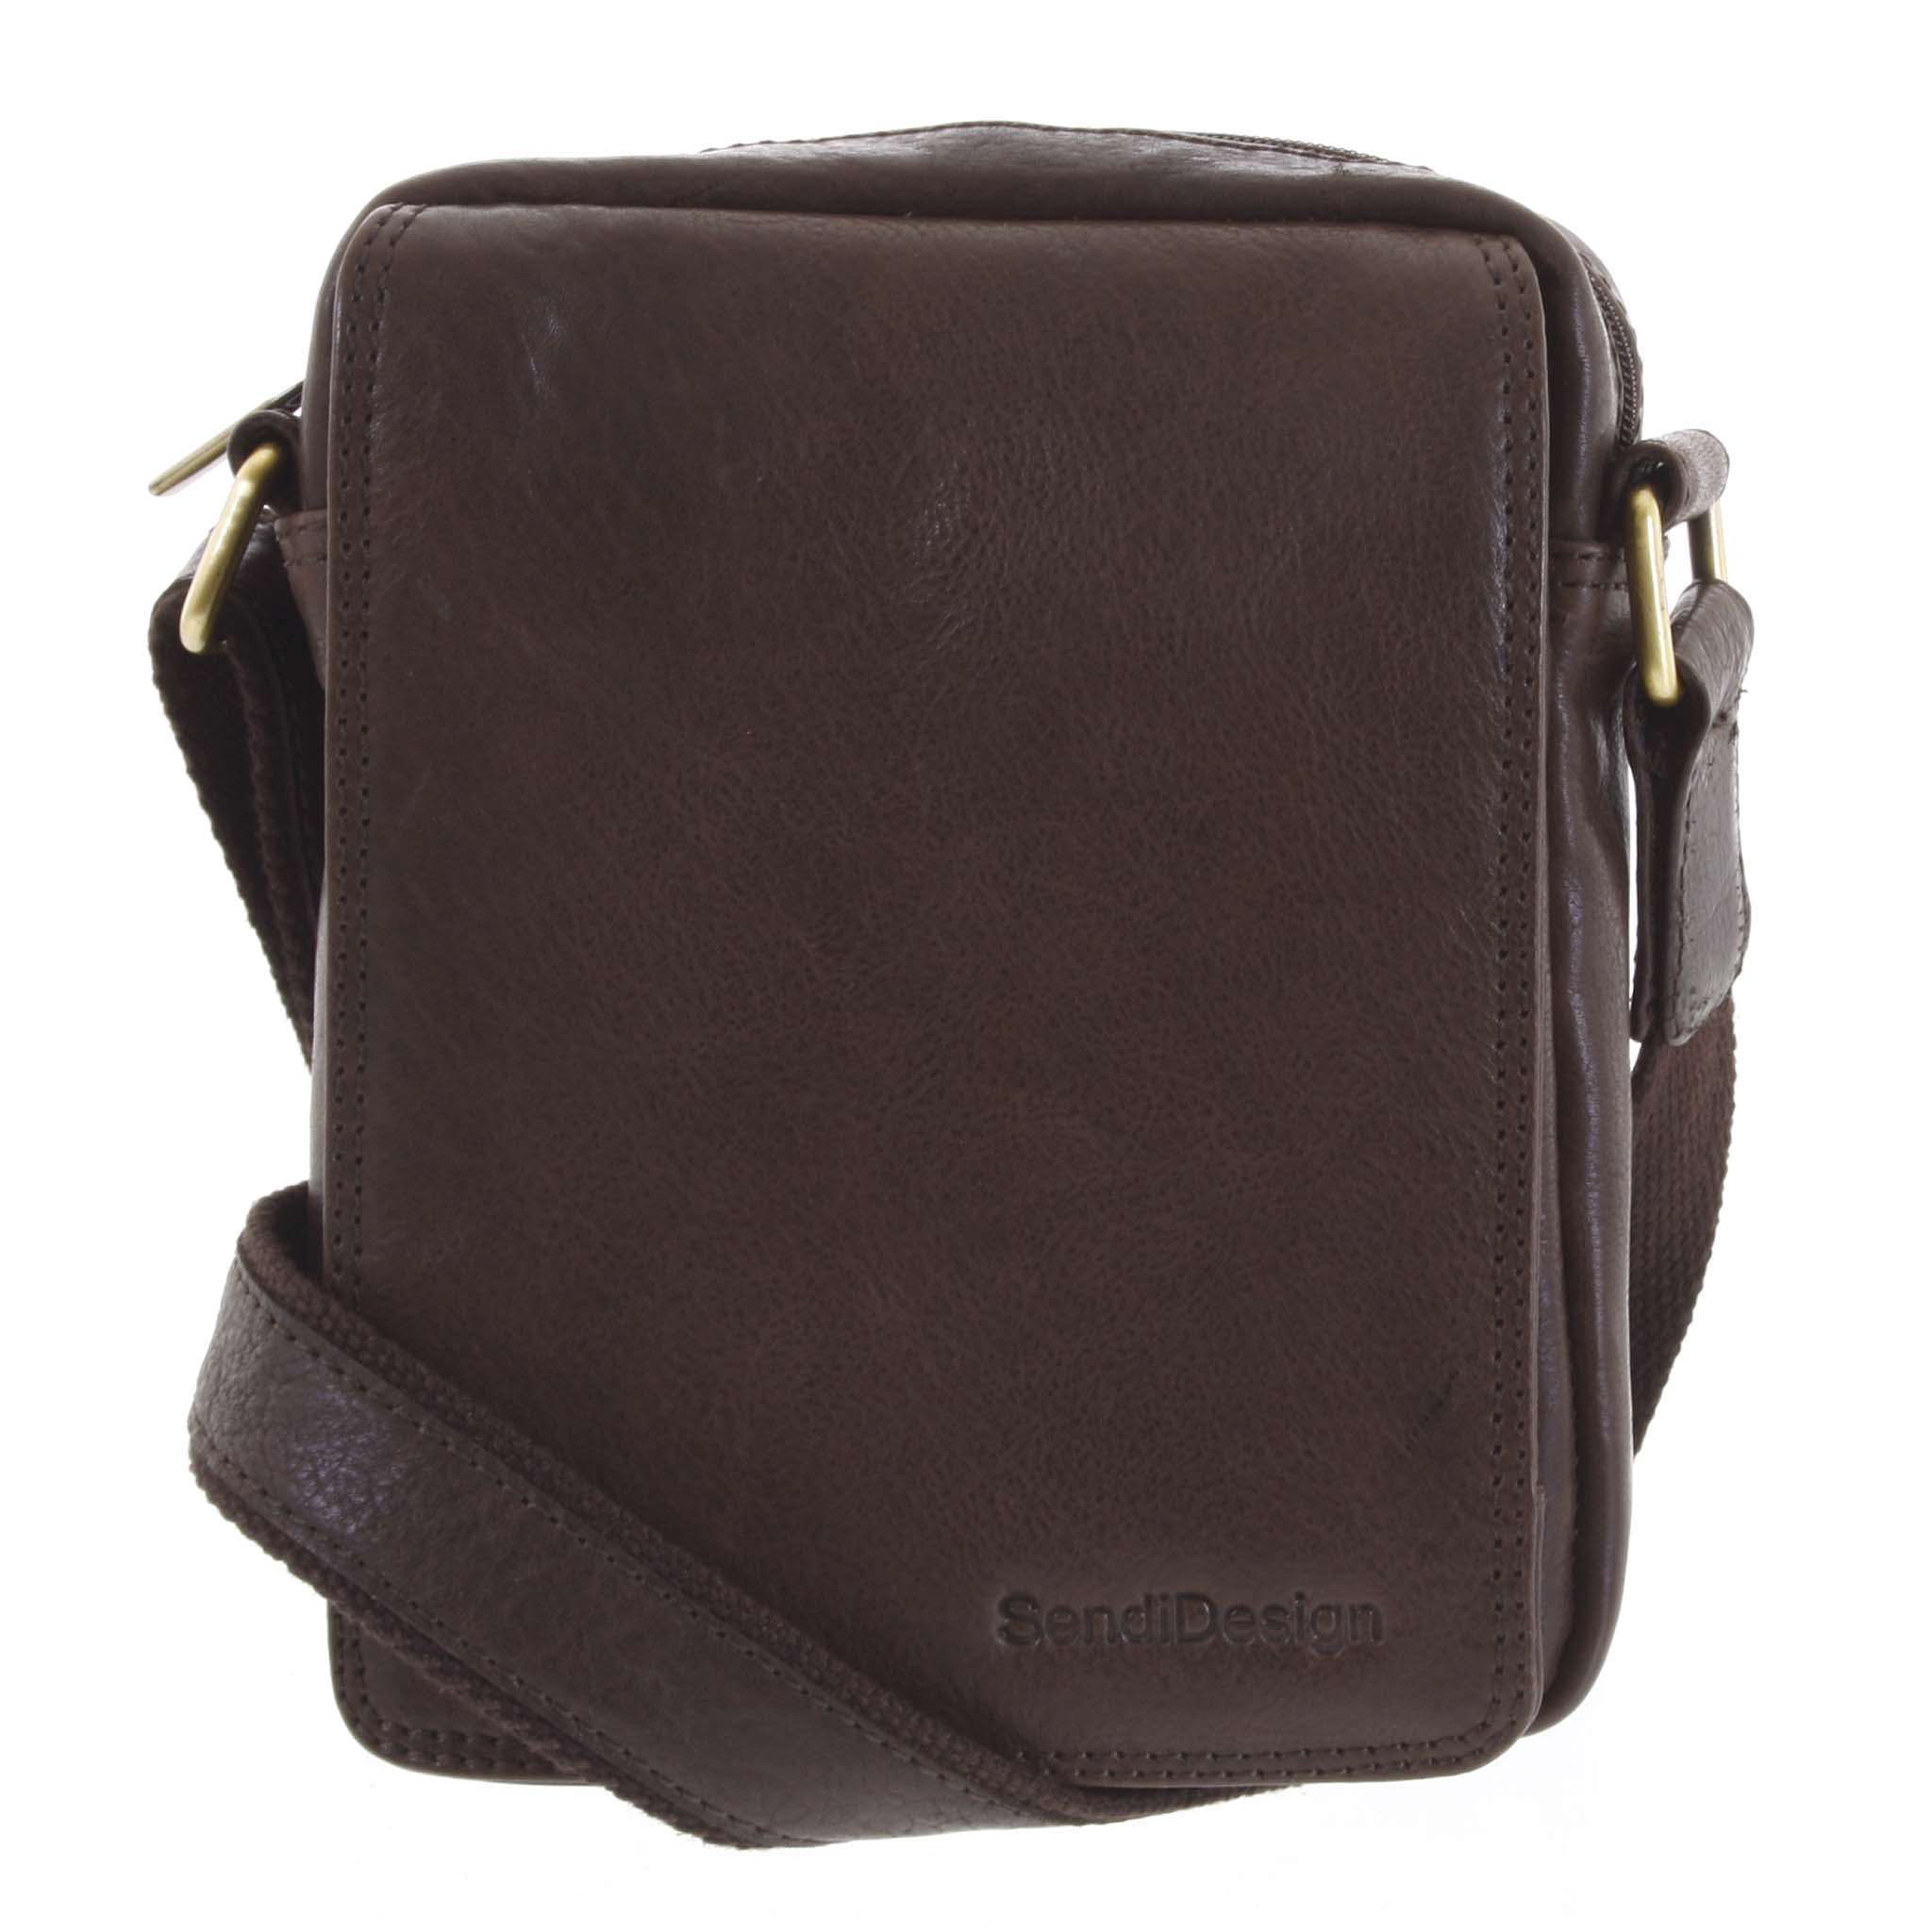 Pánská kožená taška tmavě hnědá - SendiDesign Merlim